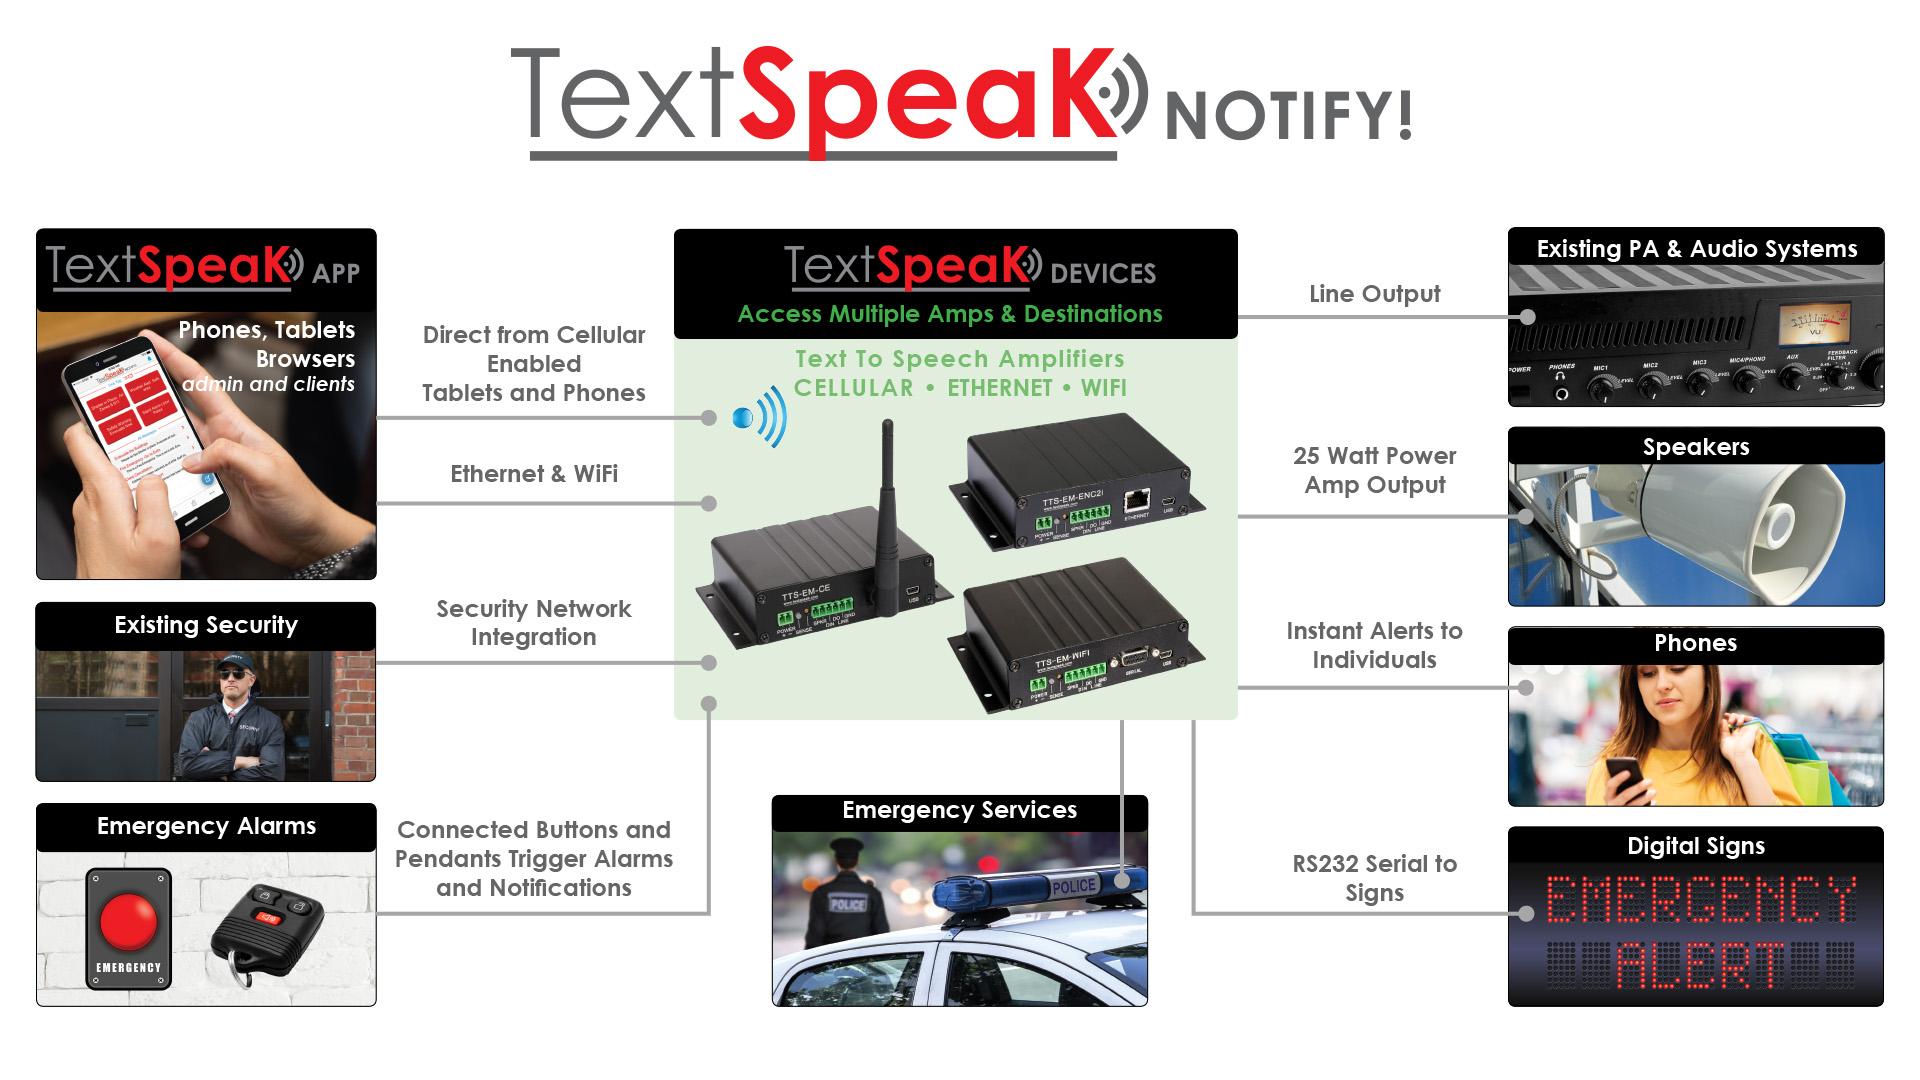 TextSpeak Complete System